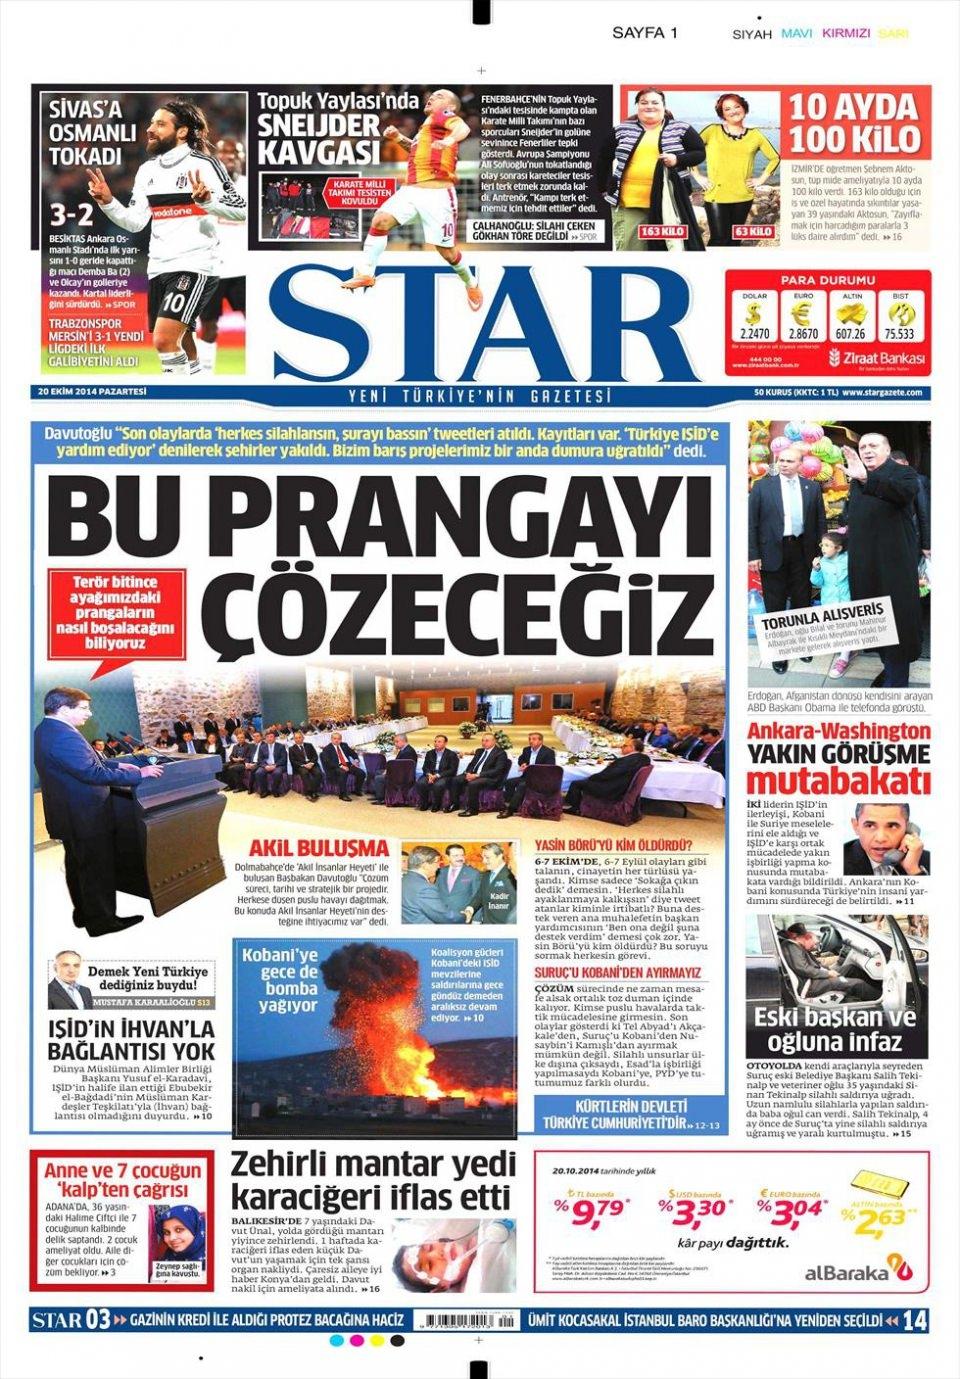 20 Ekim 2014 gazete manşetleri 17